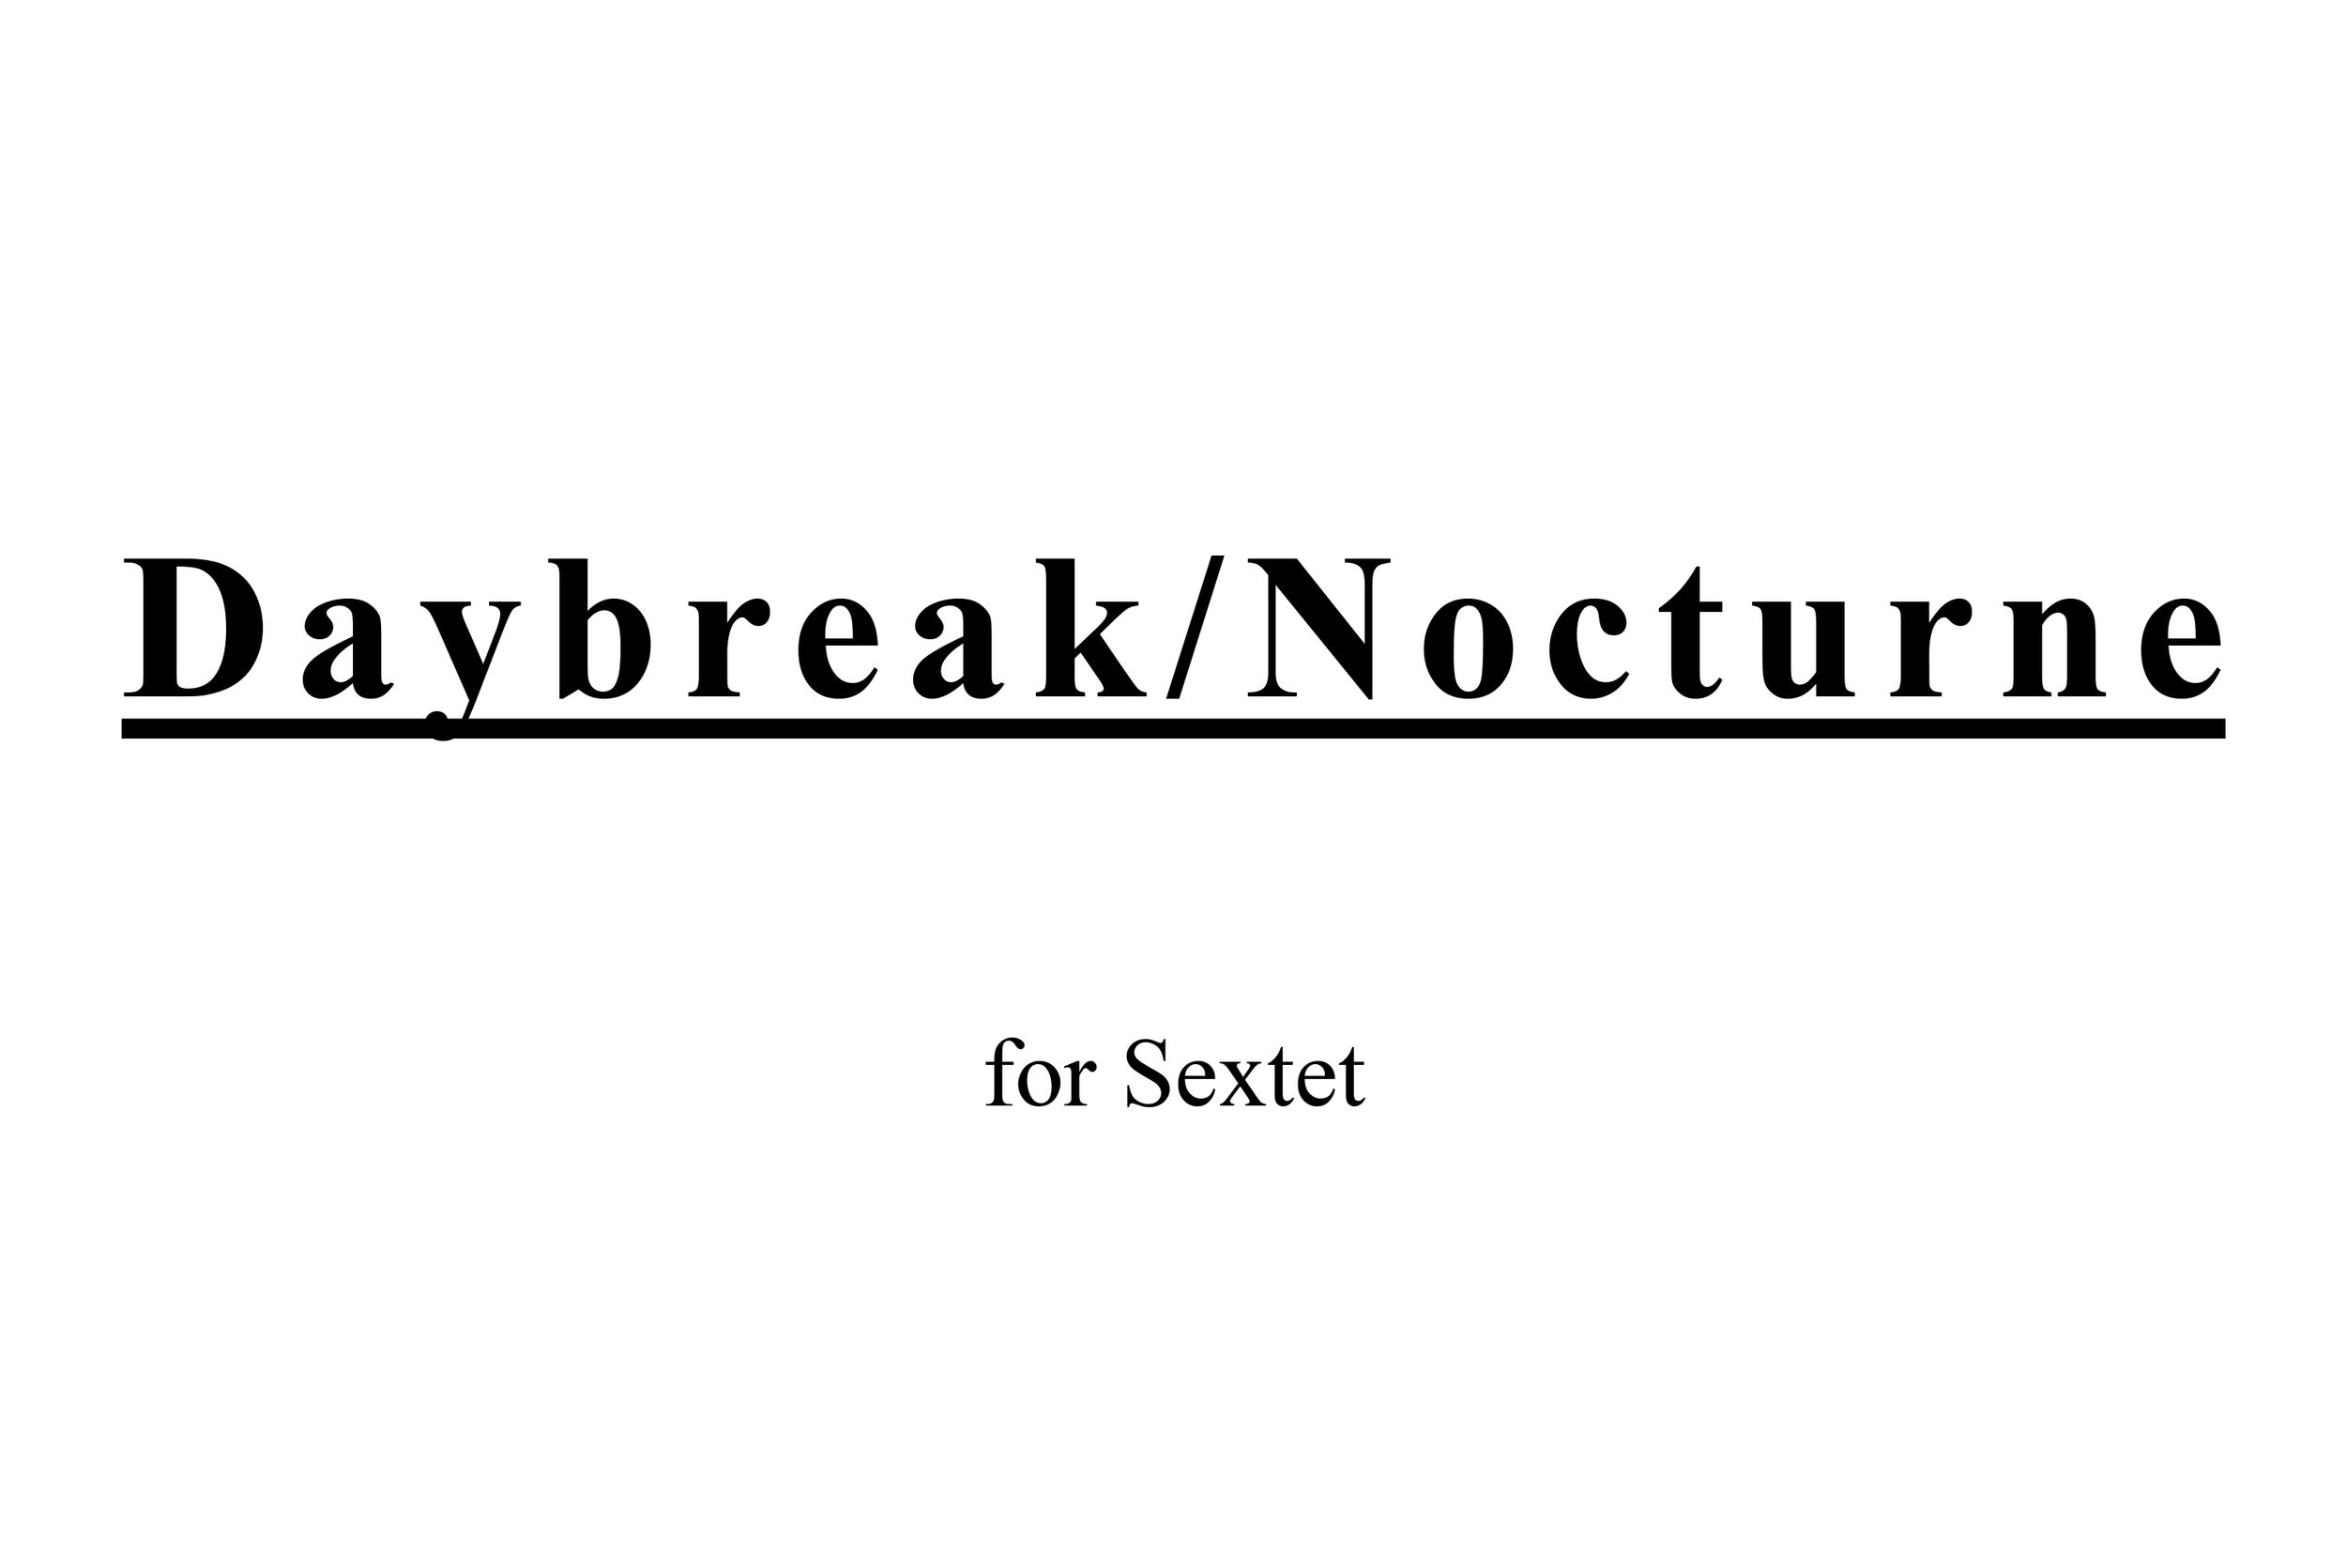 Mayse, Jon Daybreak-Nocturne-1.png